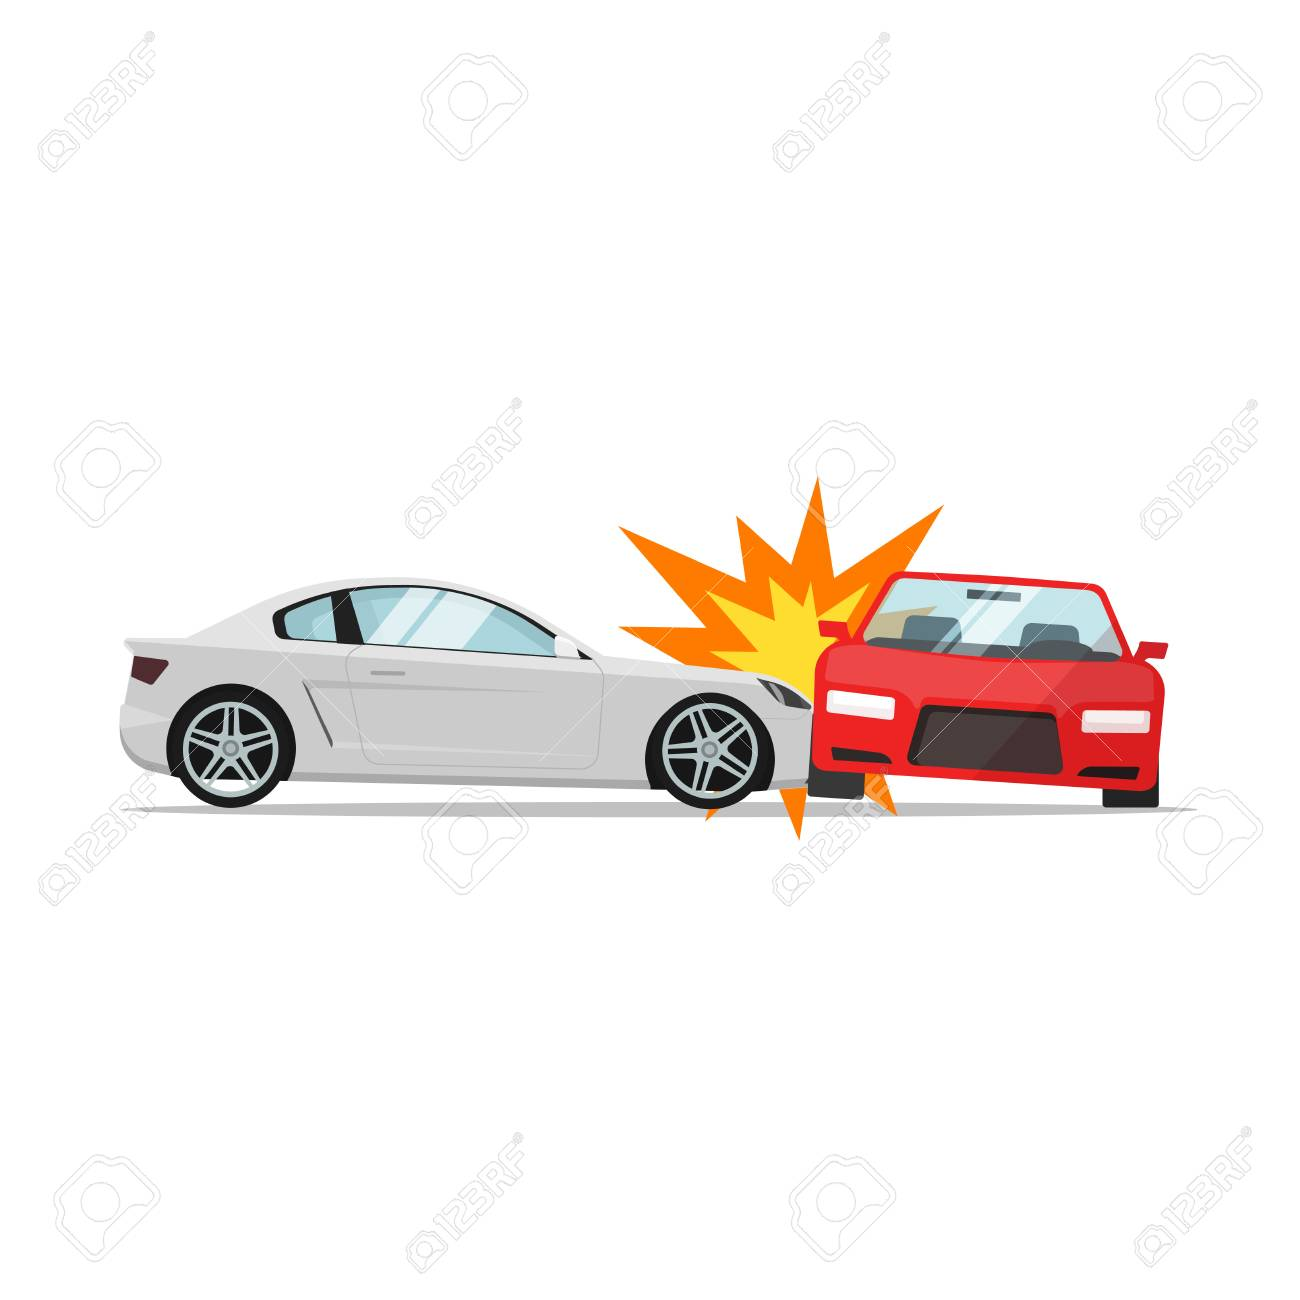 Car Crash Vector Illustration Flat Cartoon Style, Two Automobiles ...